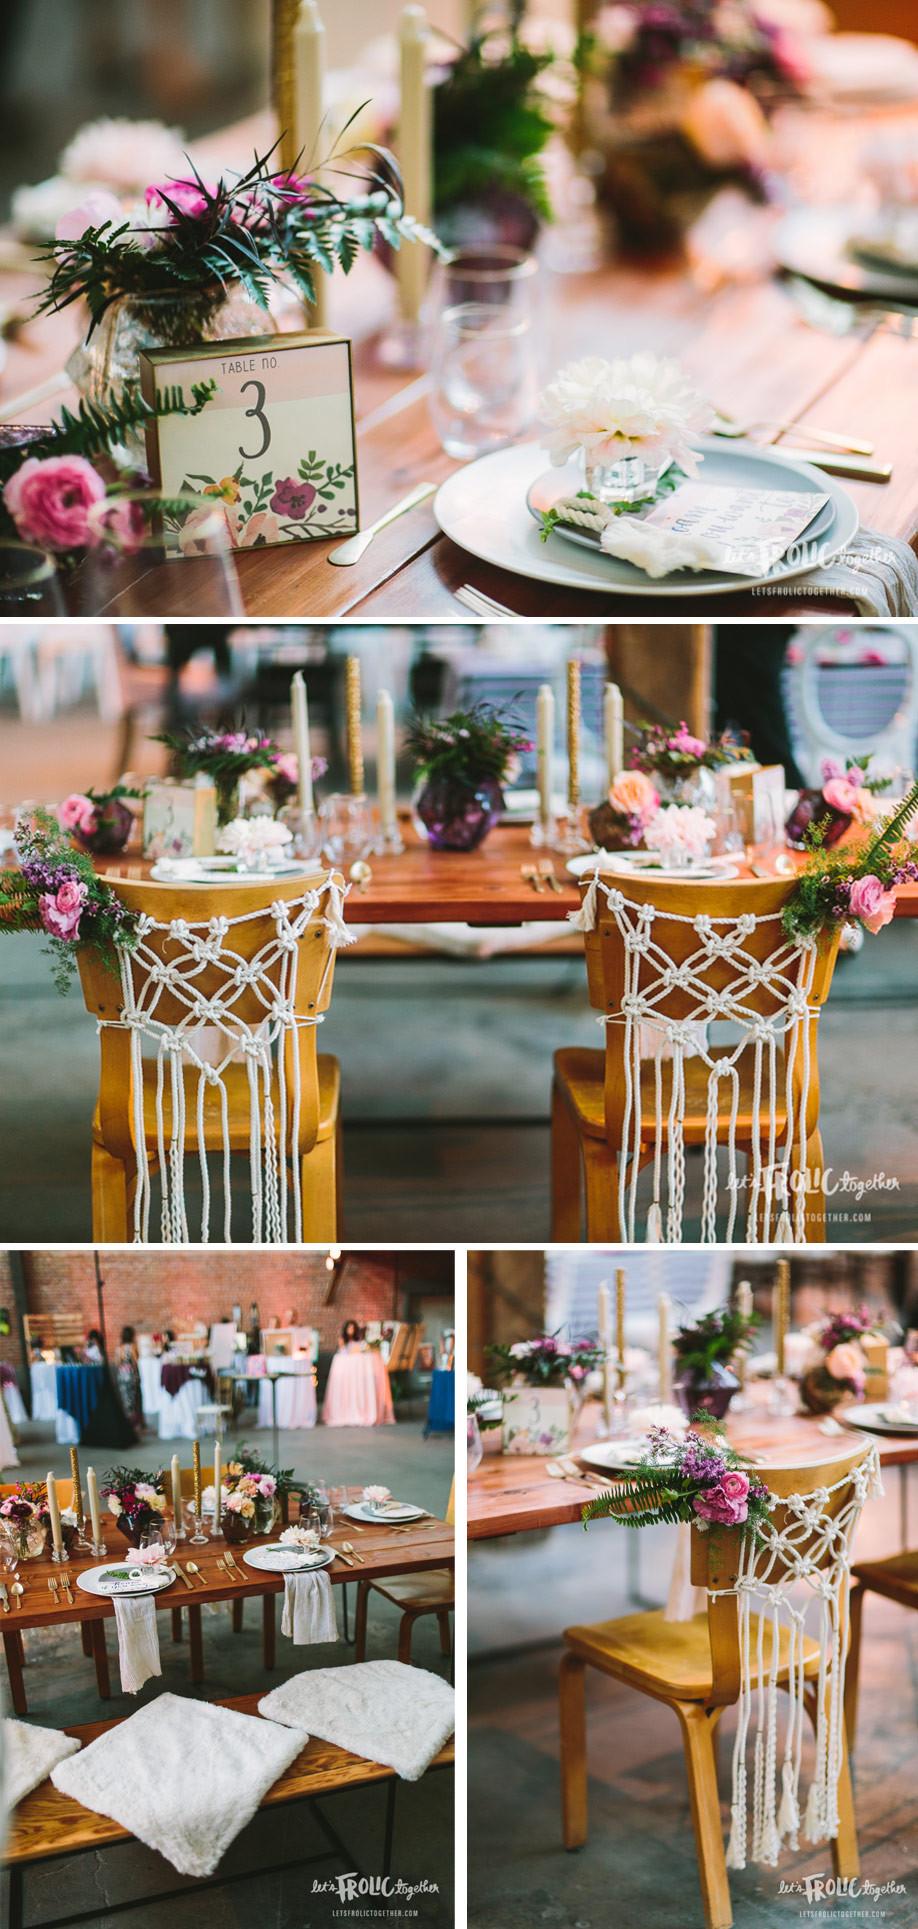 BFW_frankly.weddings_let'sfrolictogether_TABLE-3.jpg